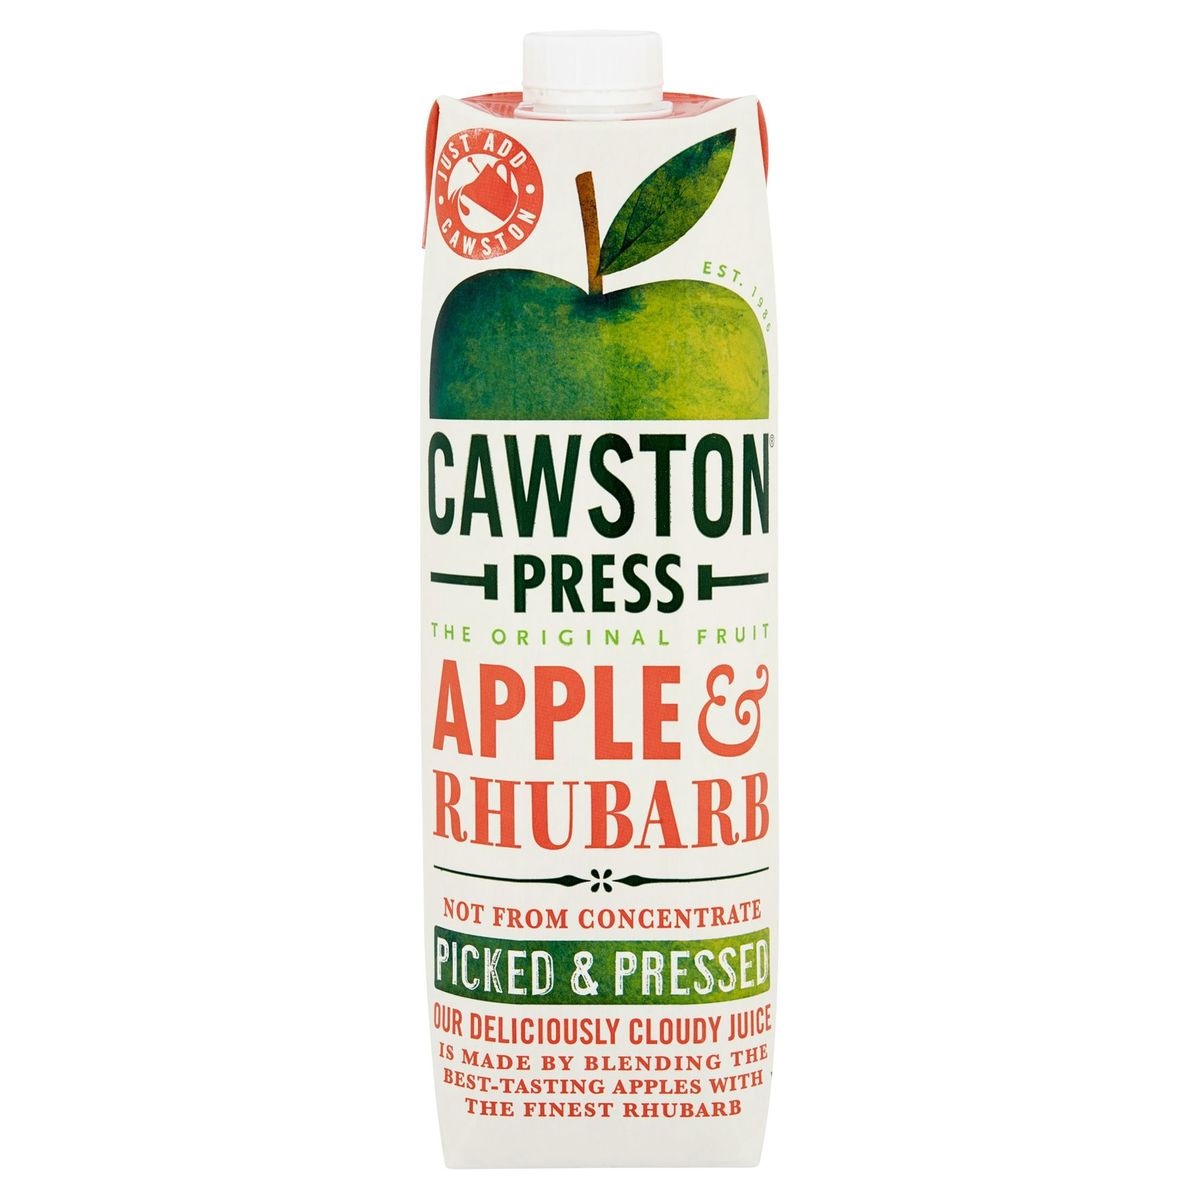 Cawston Press The Original Fruit Apple & Rhubarb 1 L